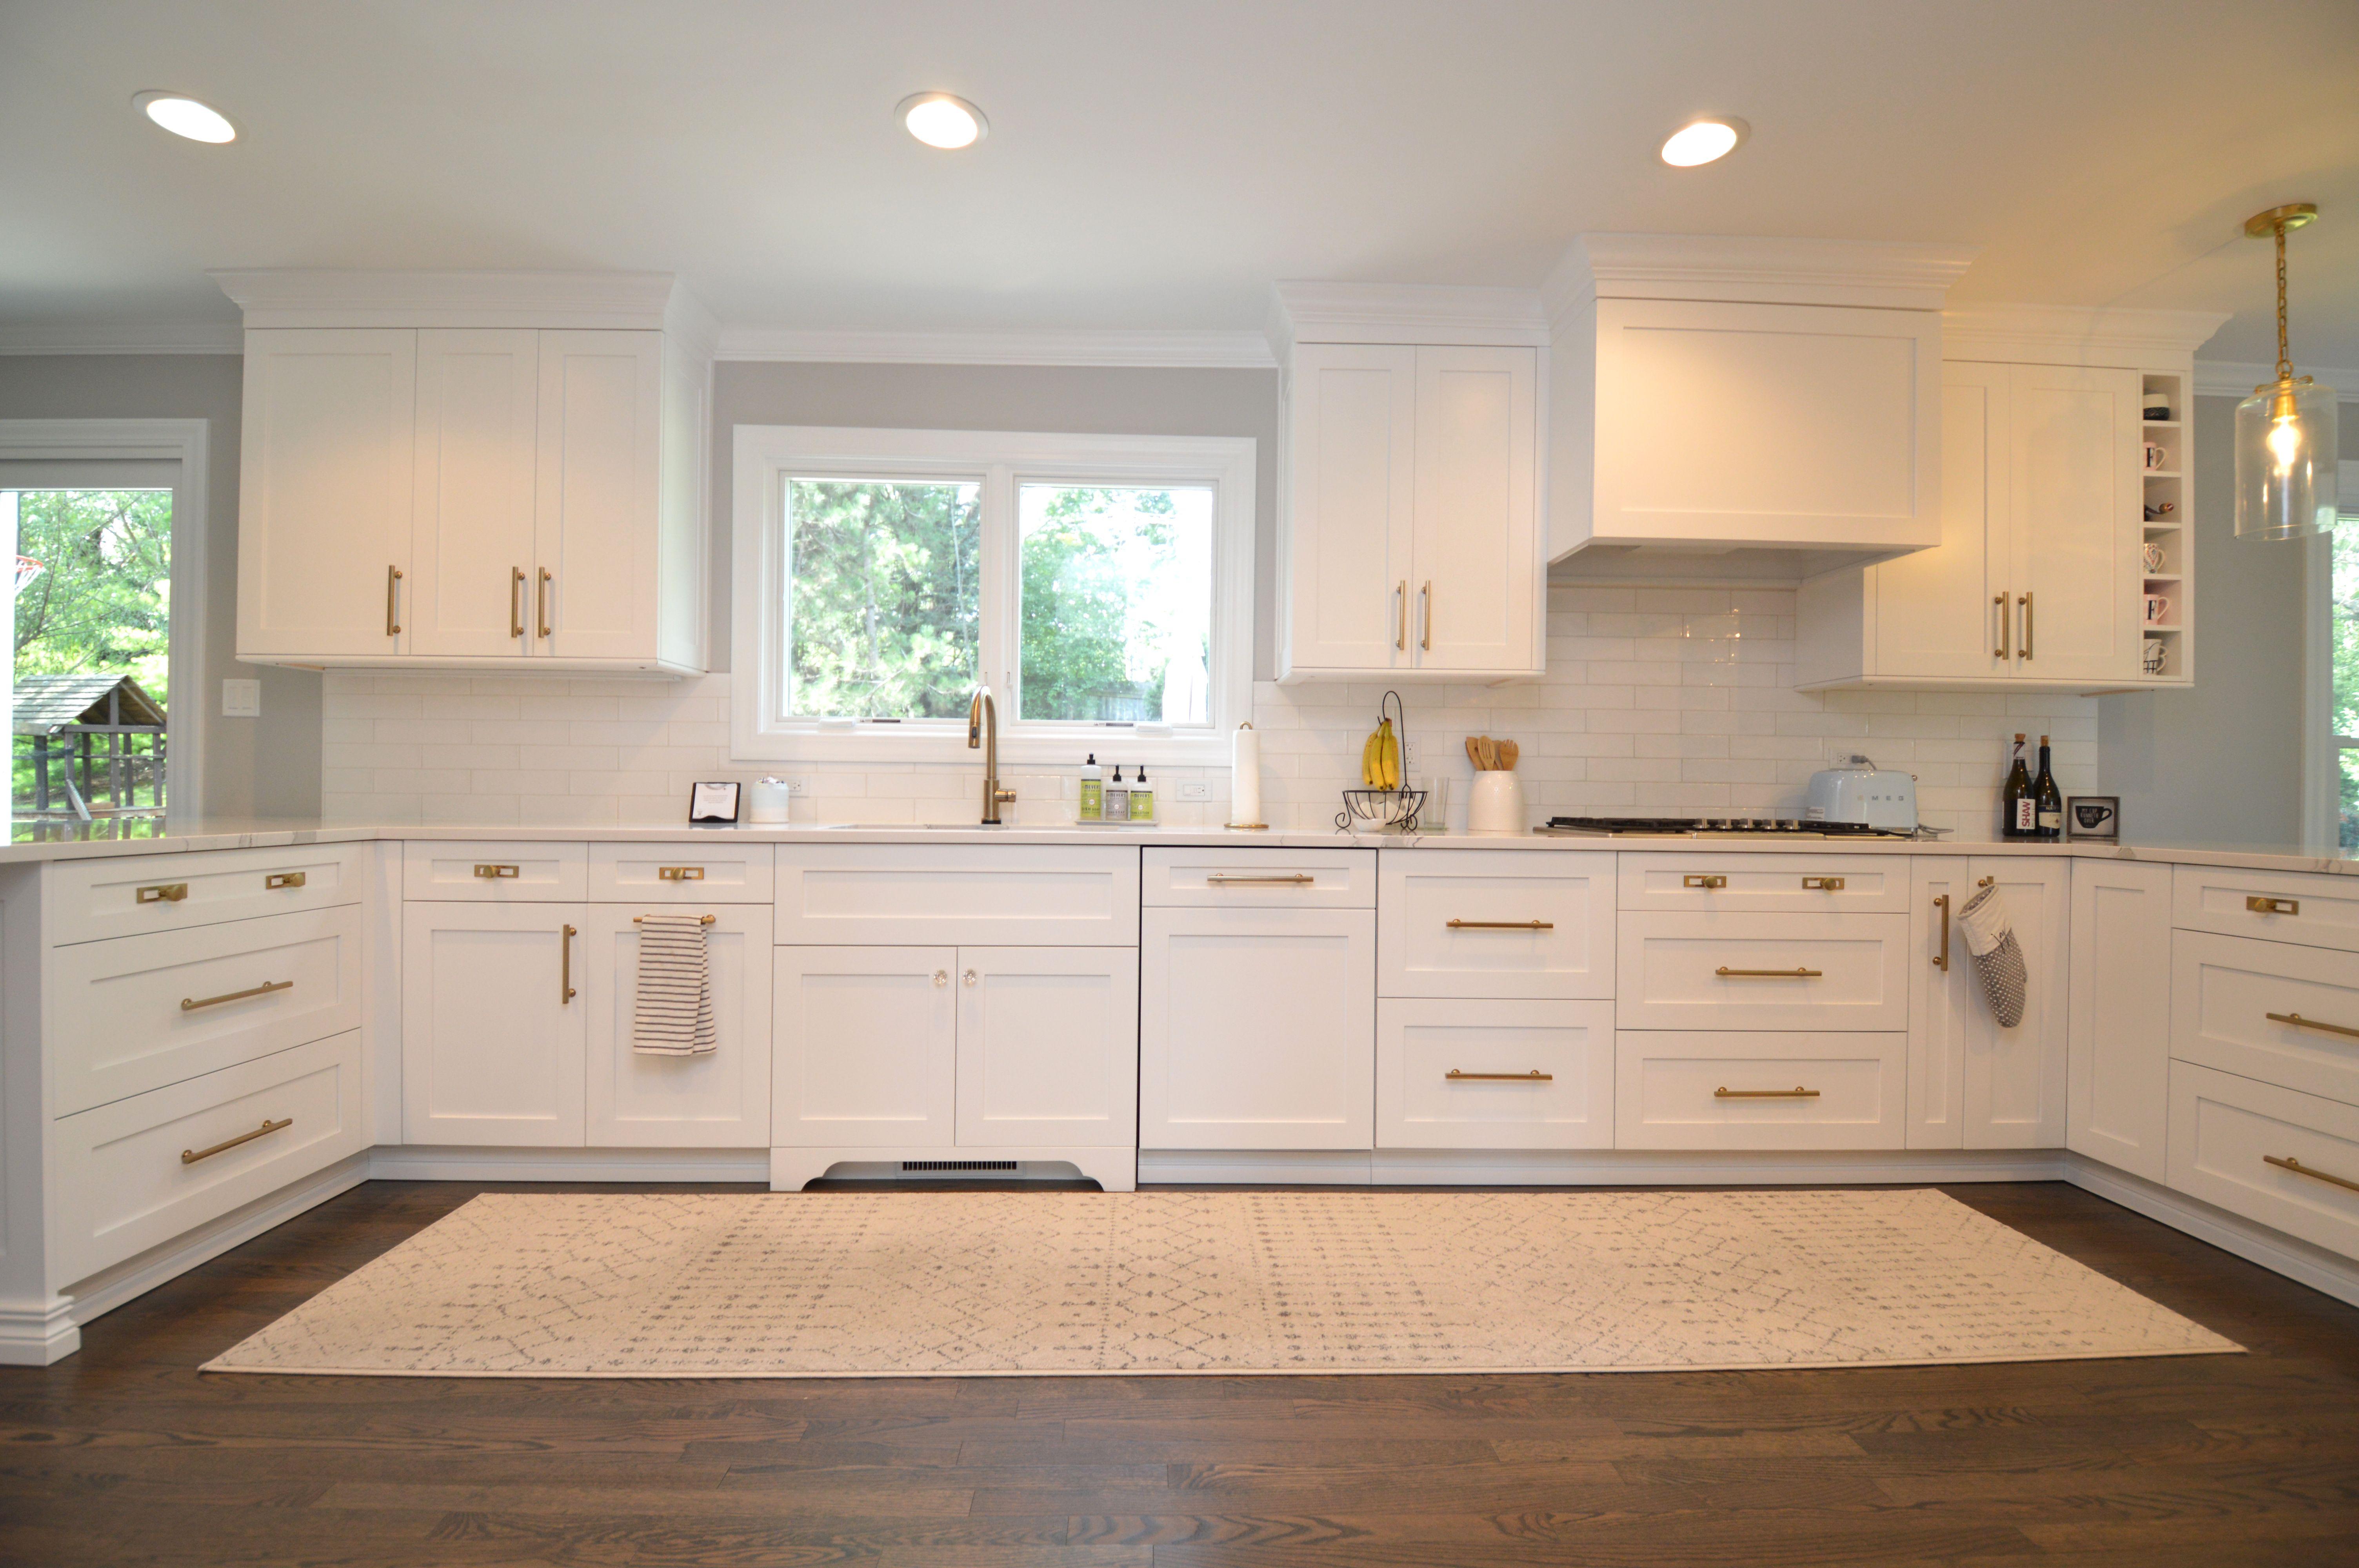 White Kitchen With Quartz Countertops, Frameless Sorrento